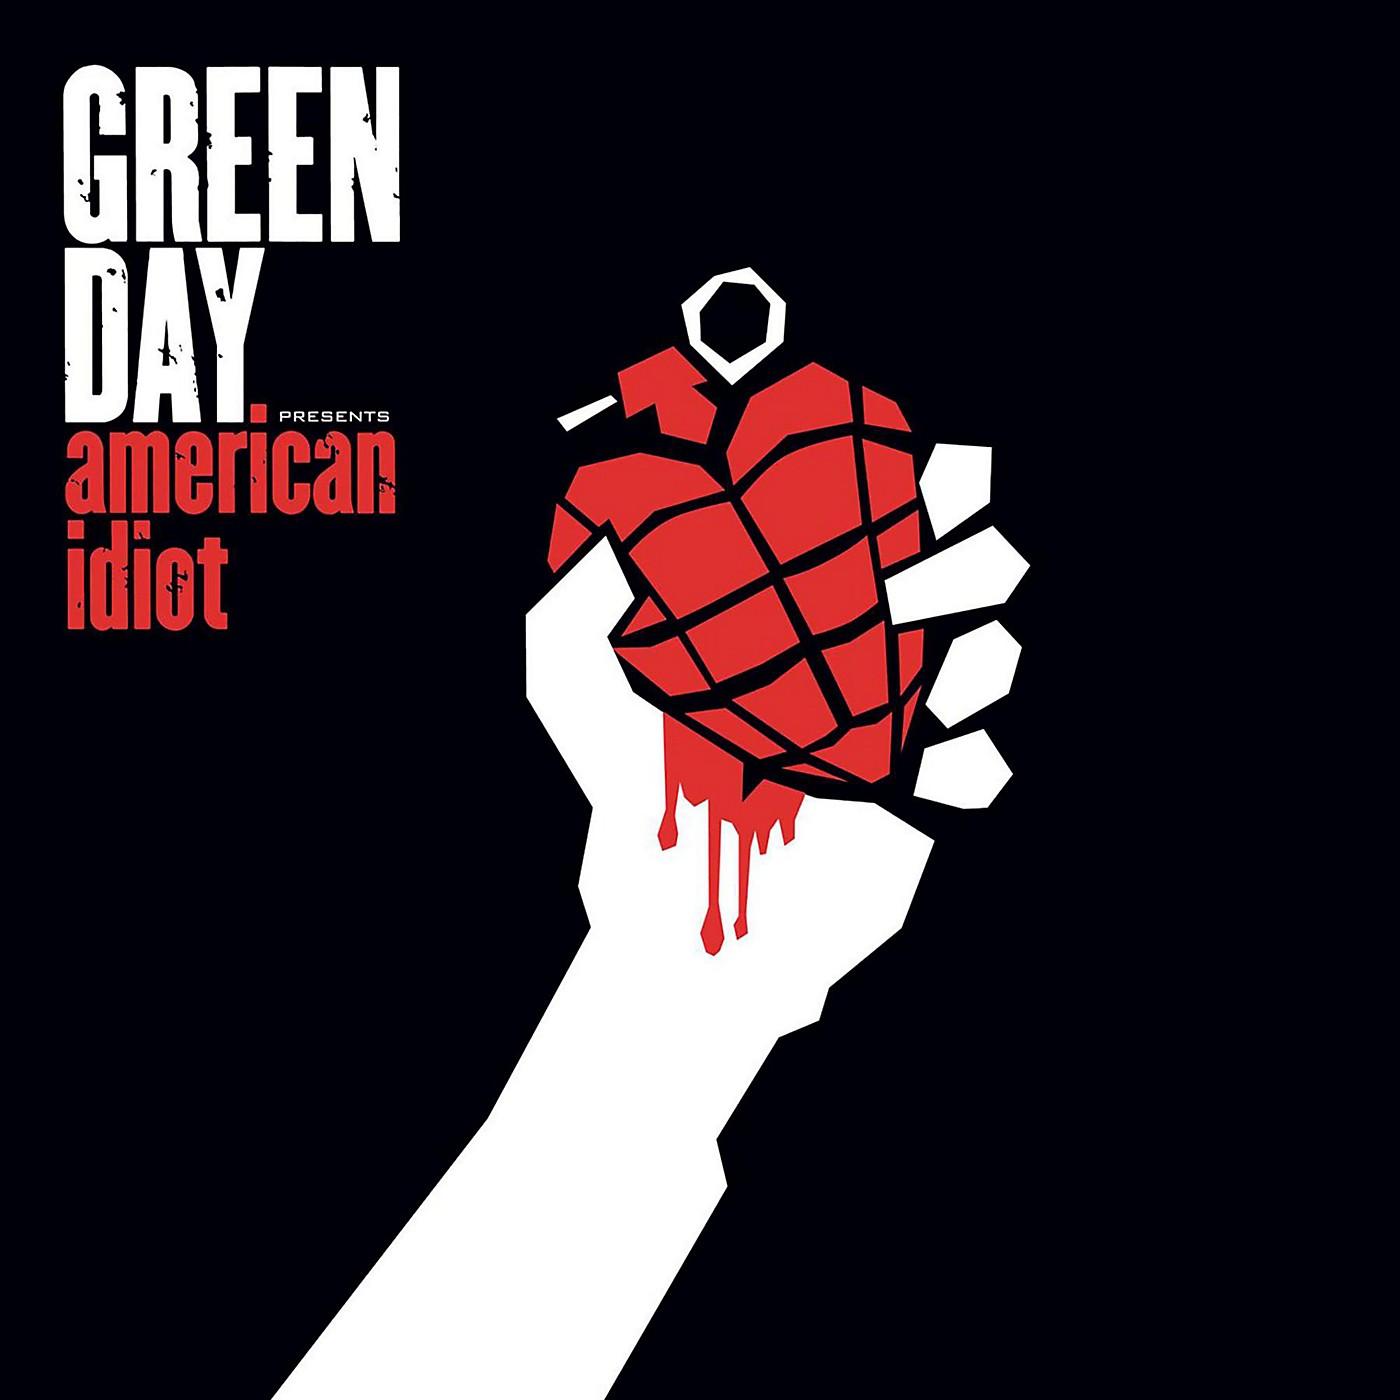 WEA Green Day - American Idiot (2Lp 180 Gram Vinyl W/Poster) thumbnail